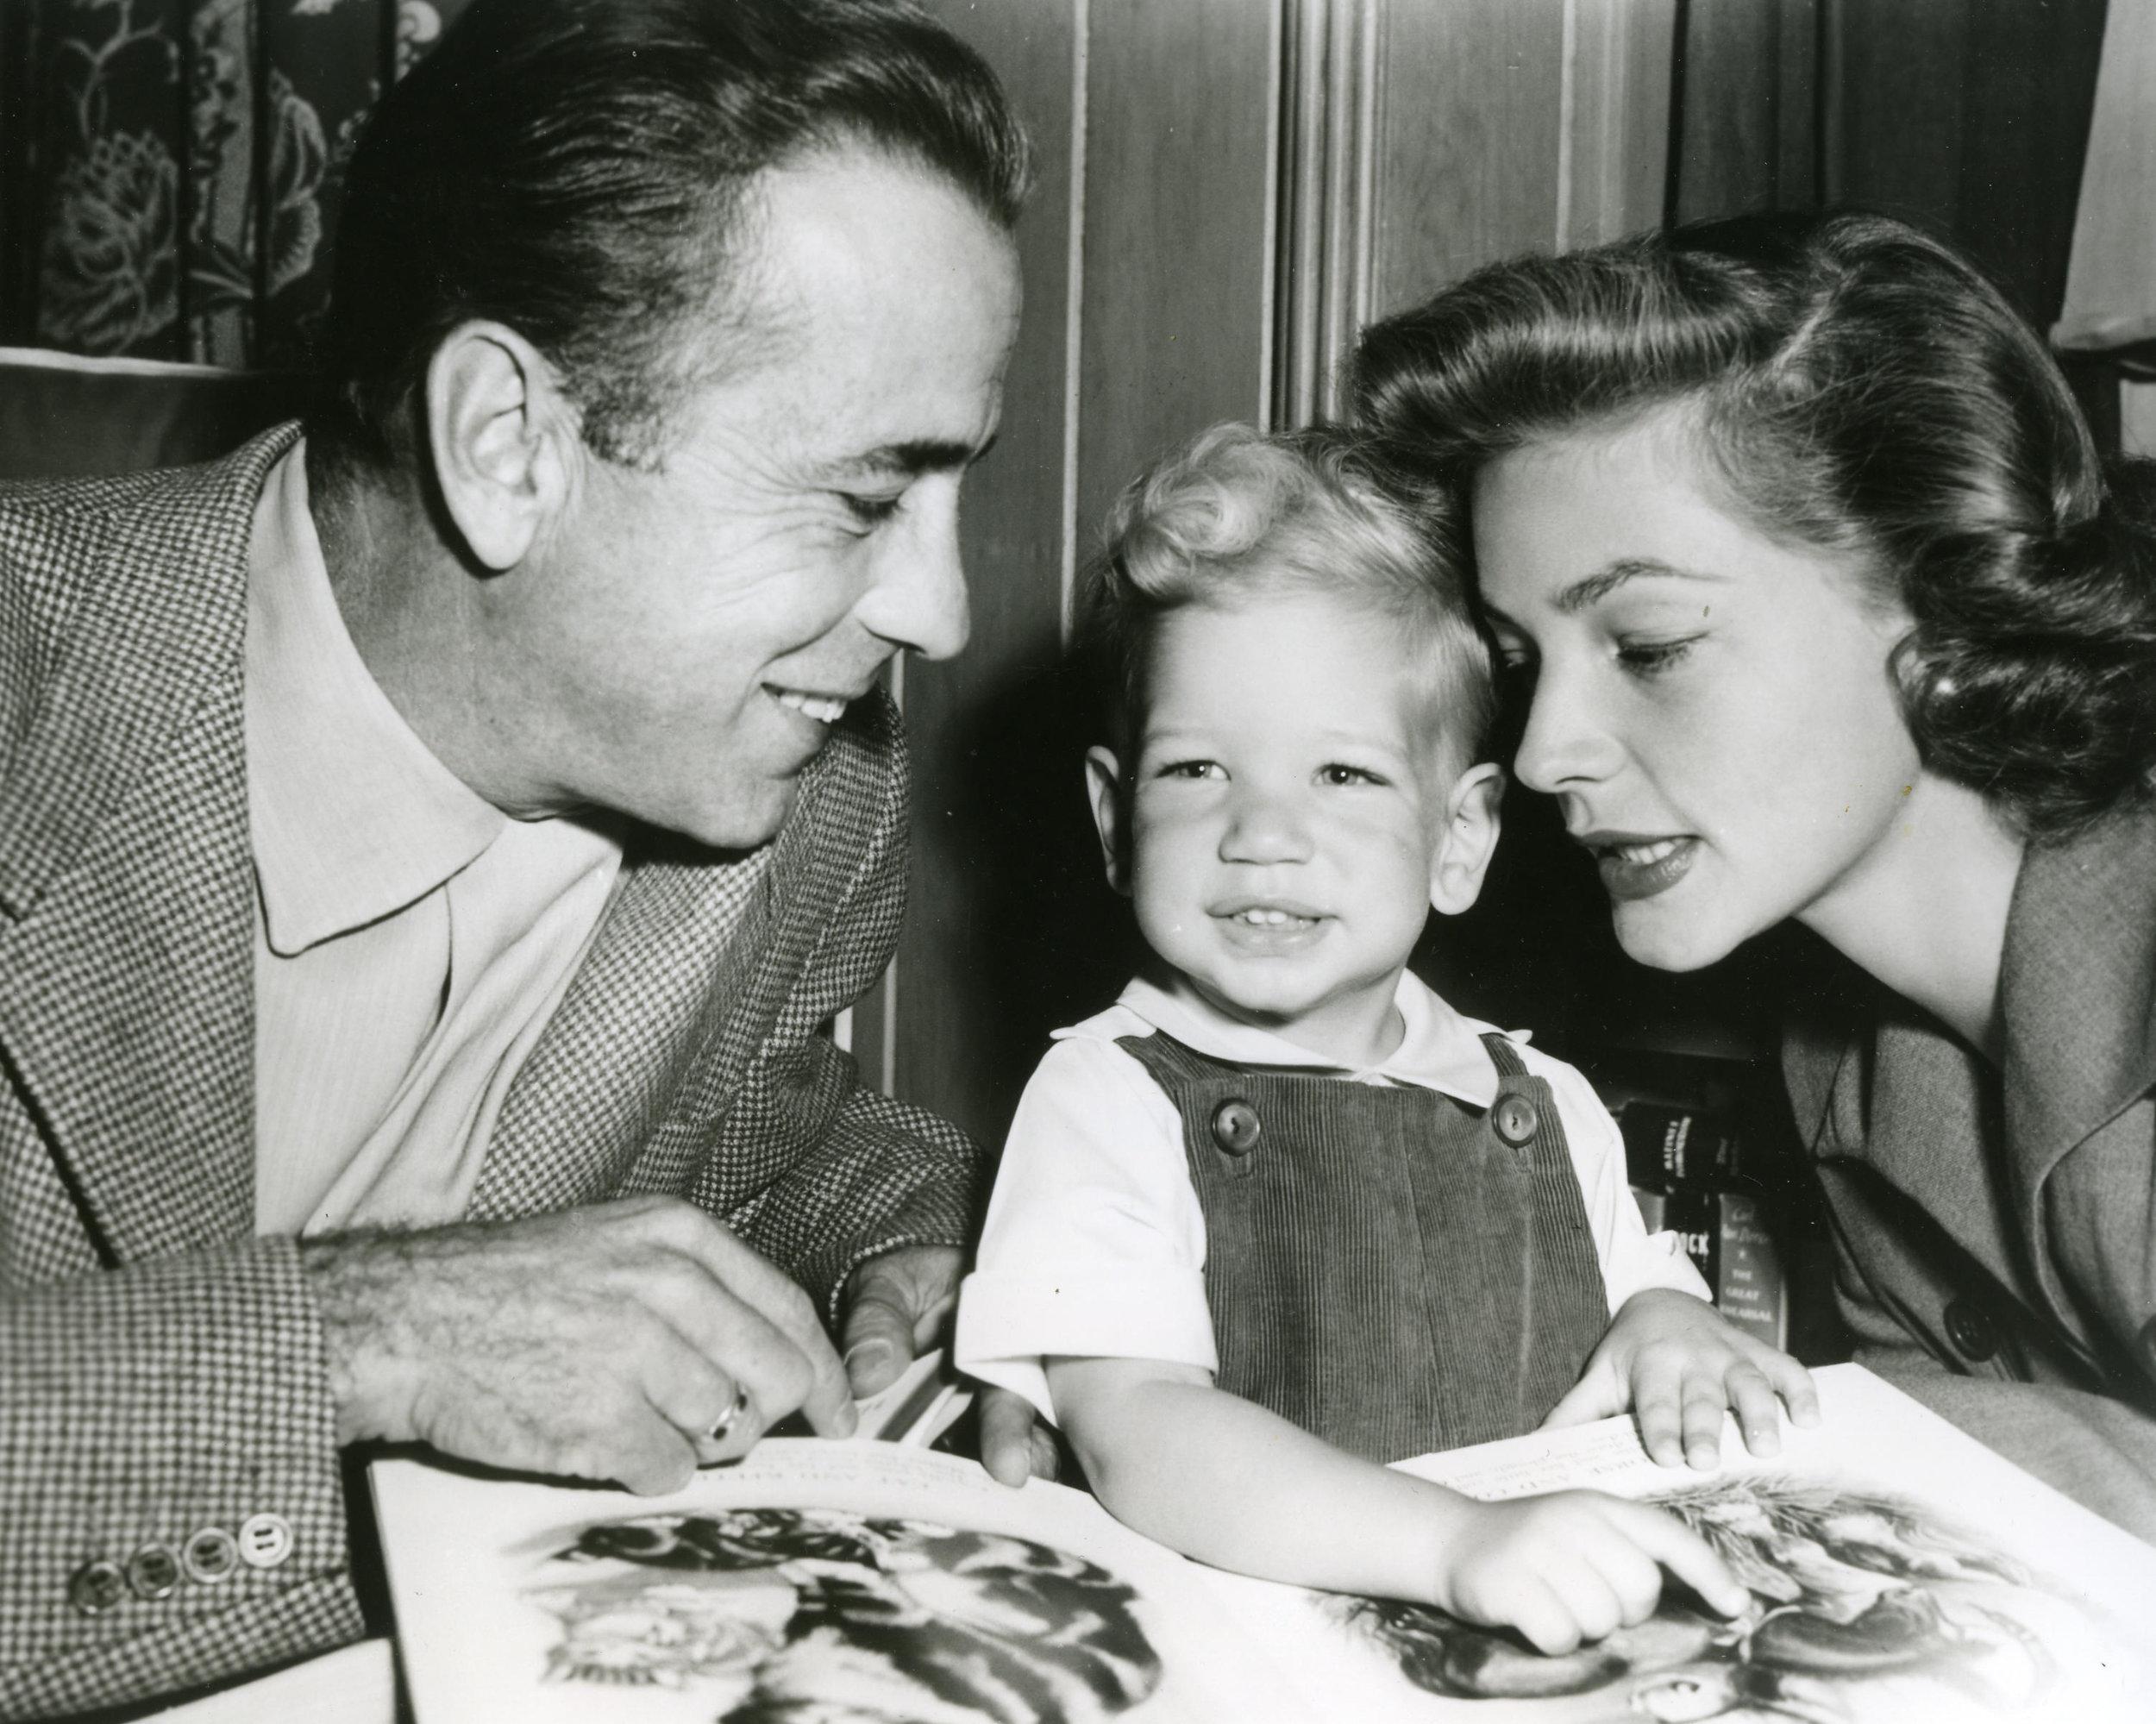 Happy parents with their son Stephen around 1951